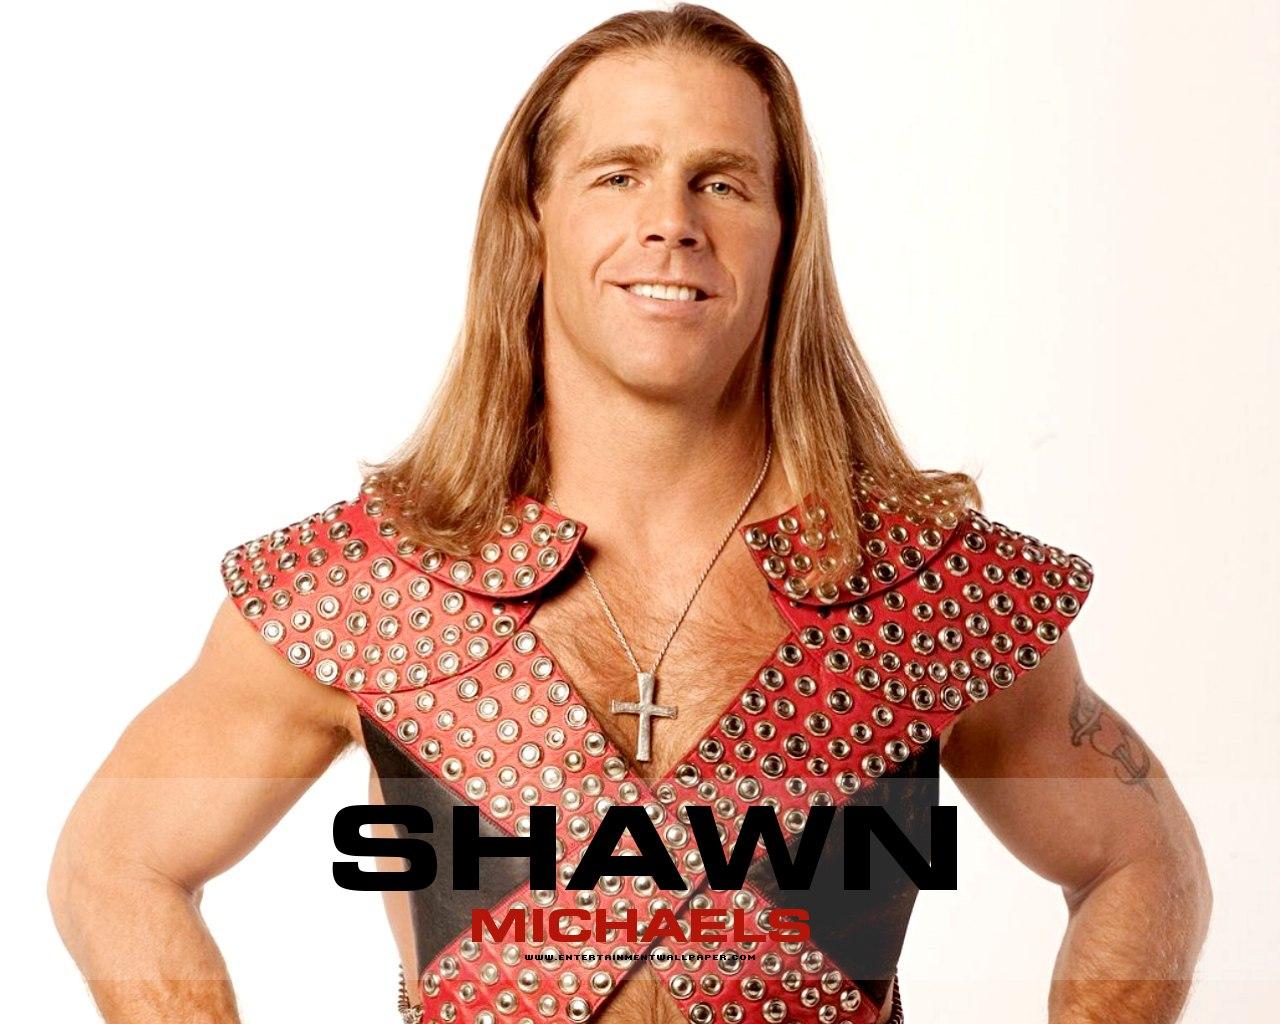 Shawn Michaels net worth